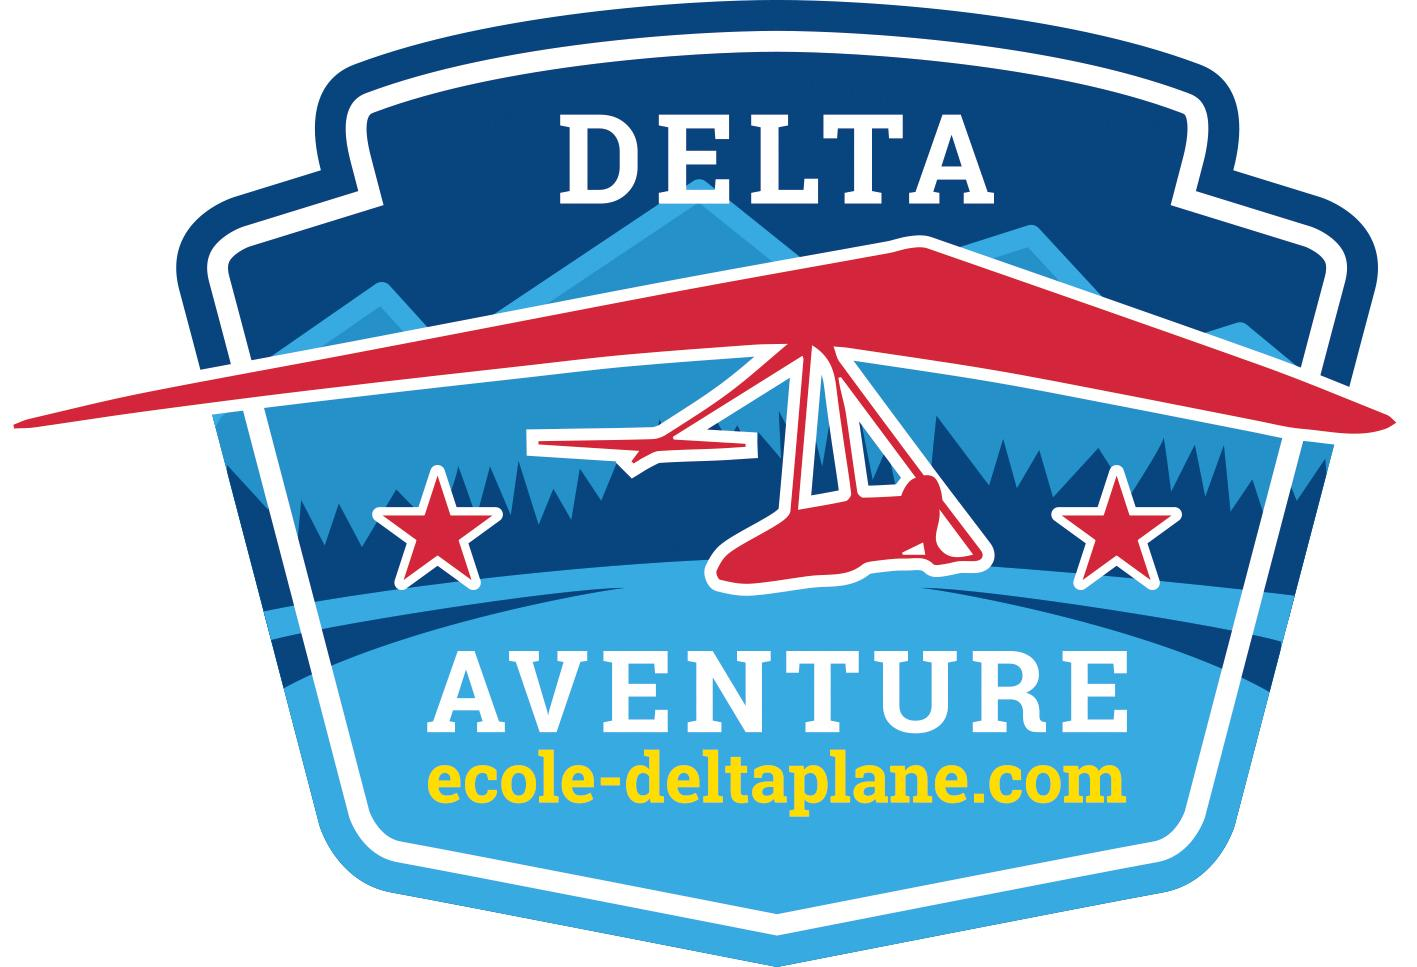 Delta aventure logo 1